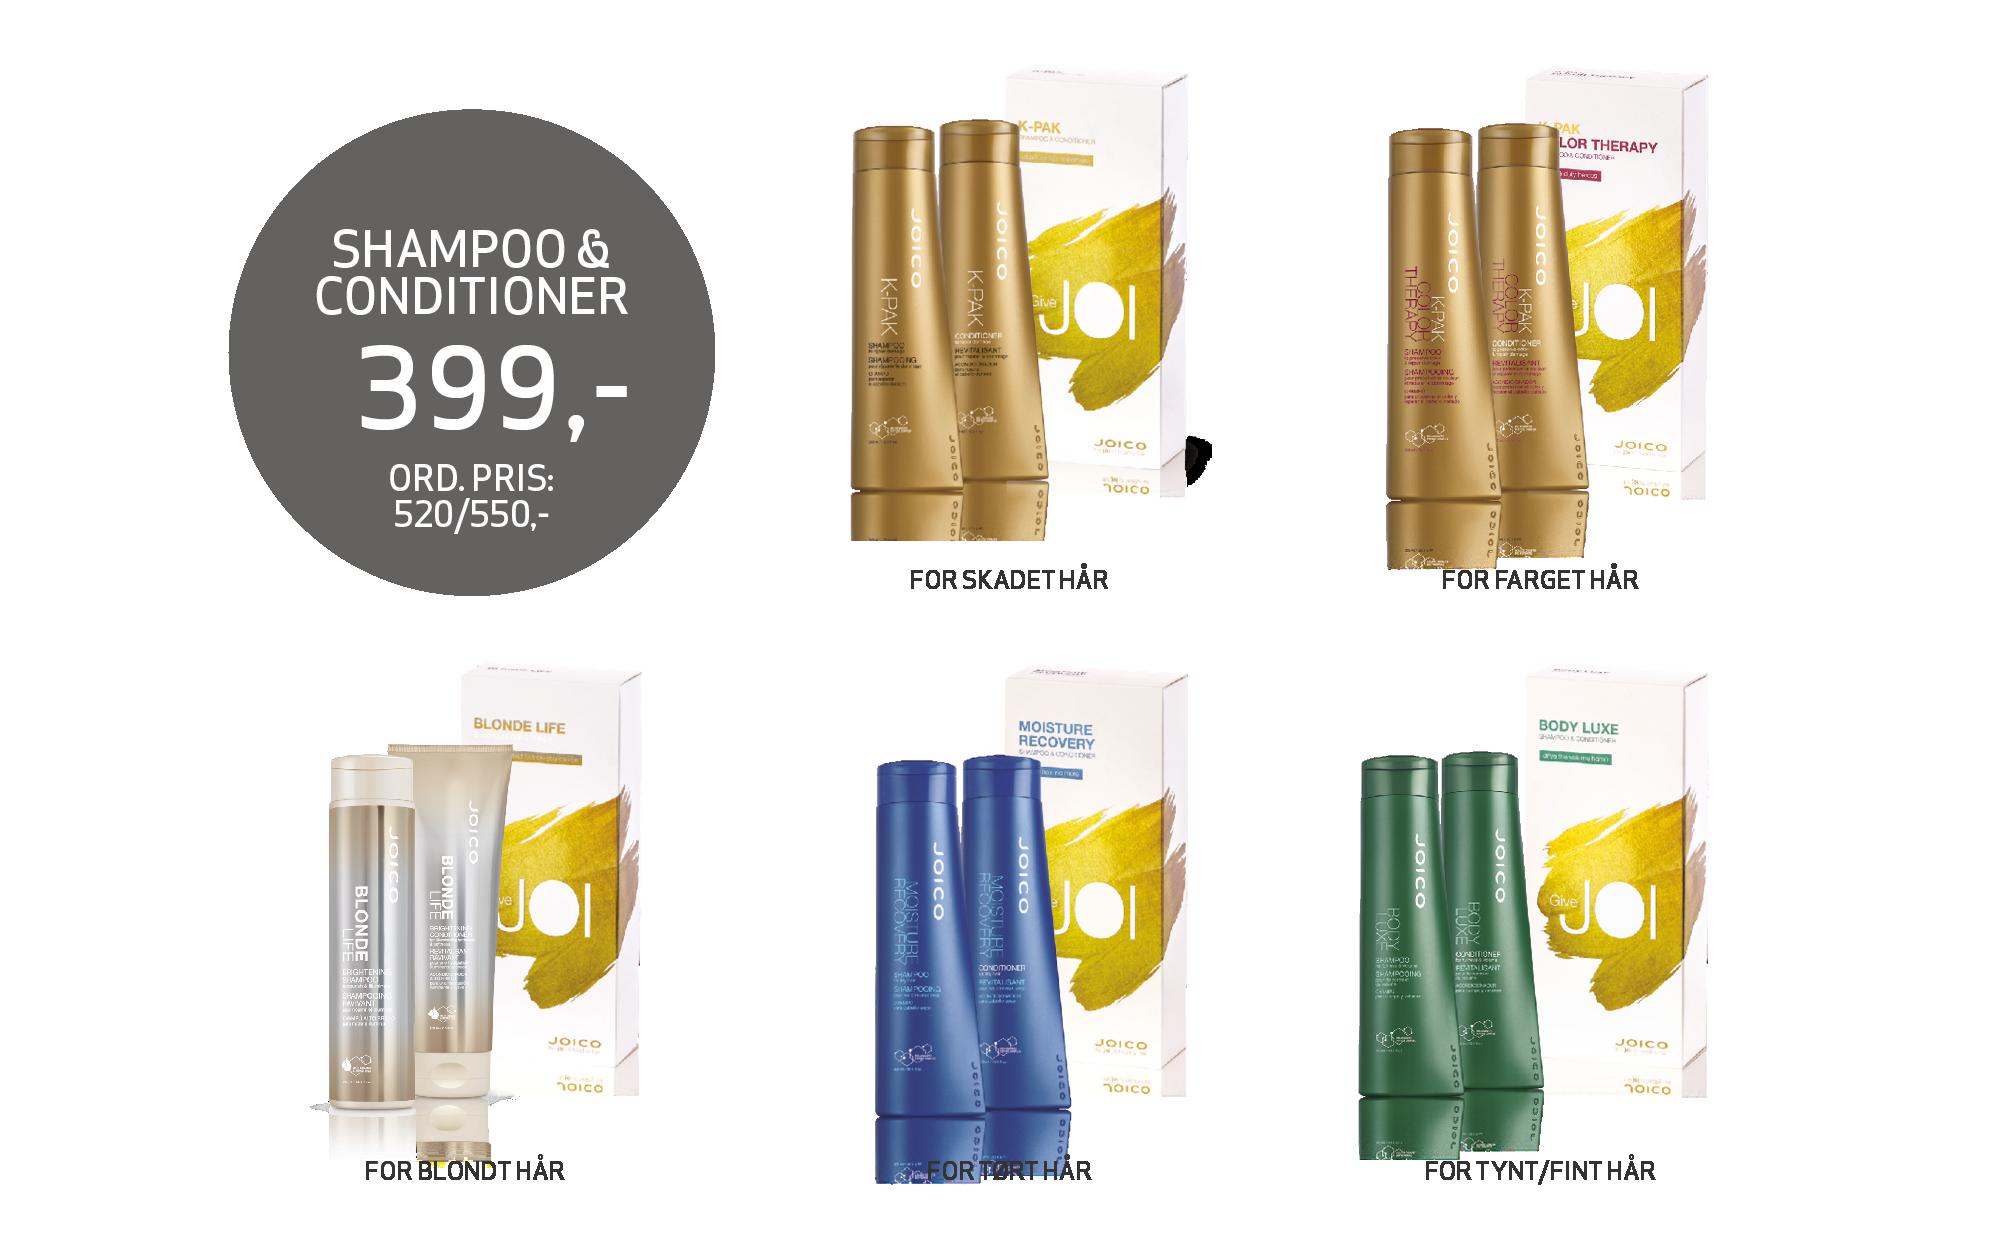 JOICO gaveesker Shampoo & Conditioner